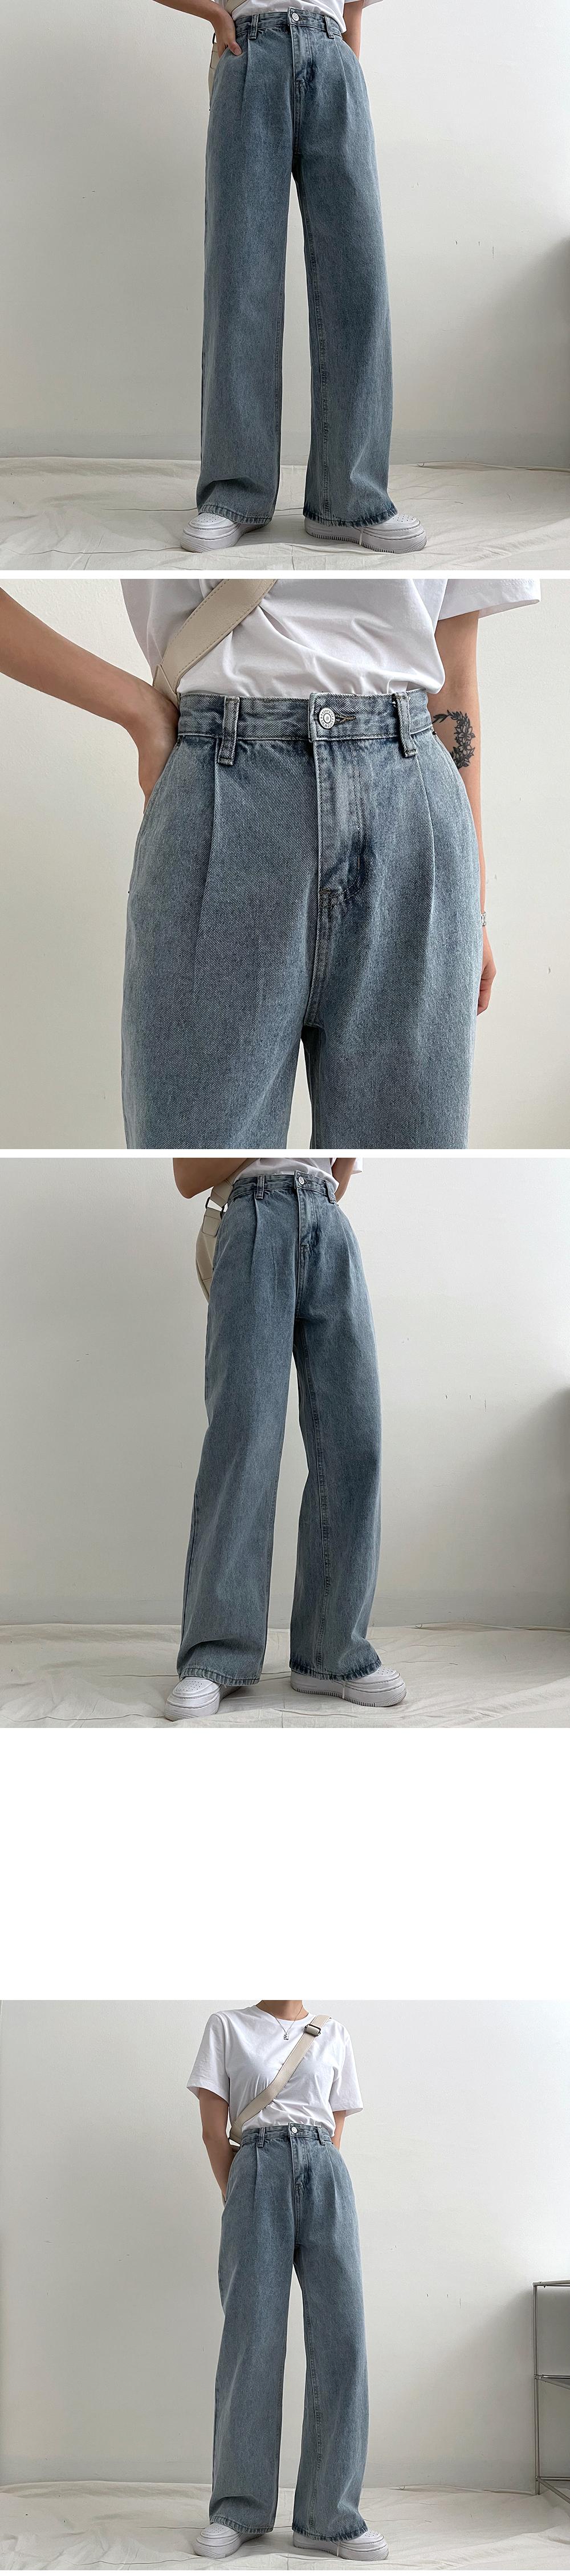 Randy Pintuck Wide Denim Pants